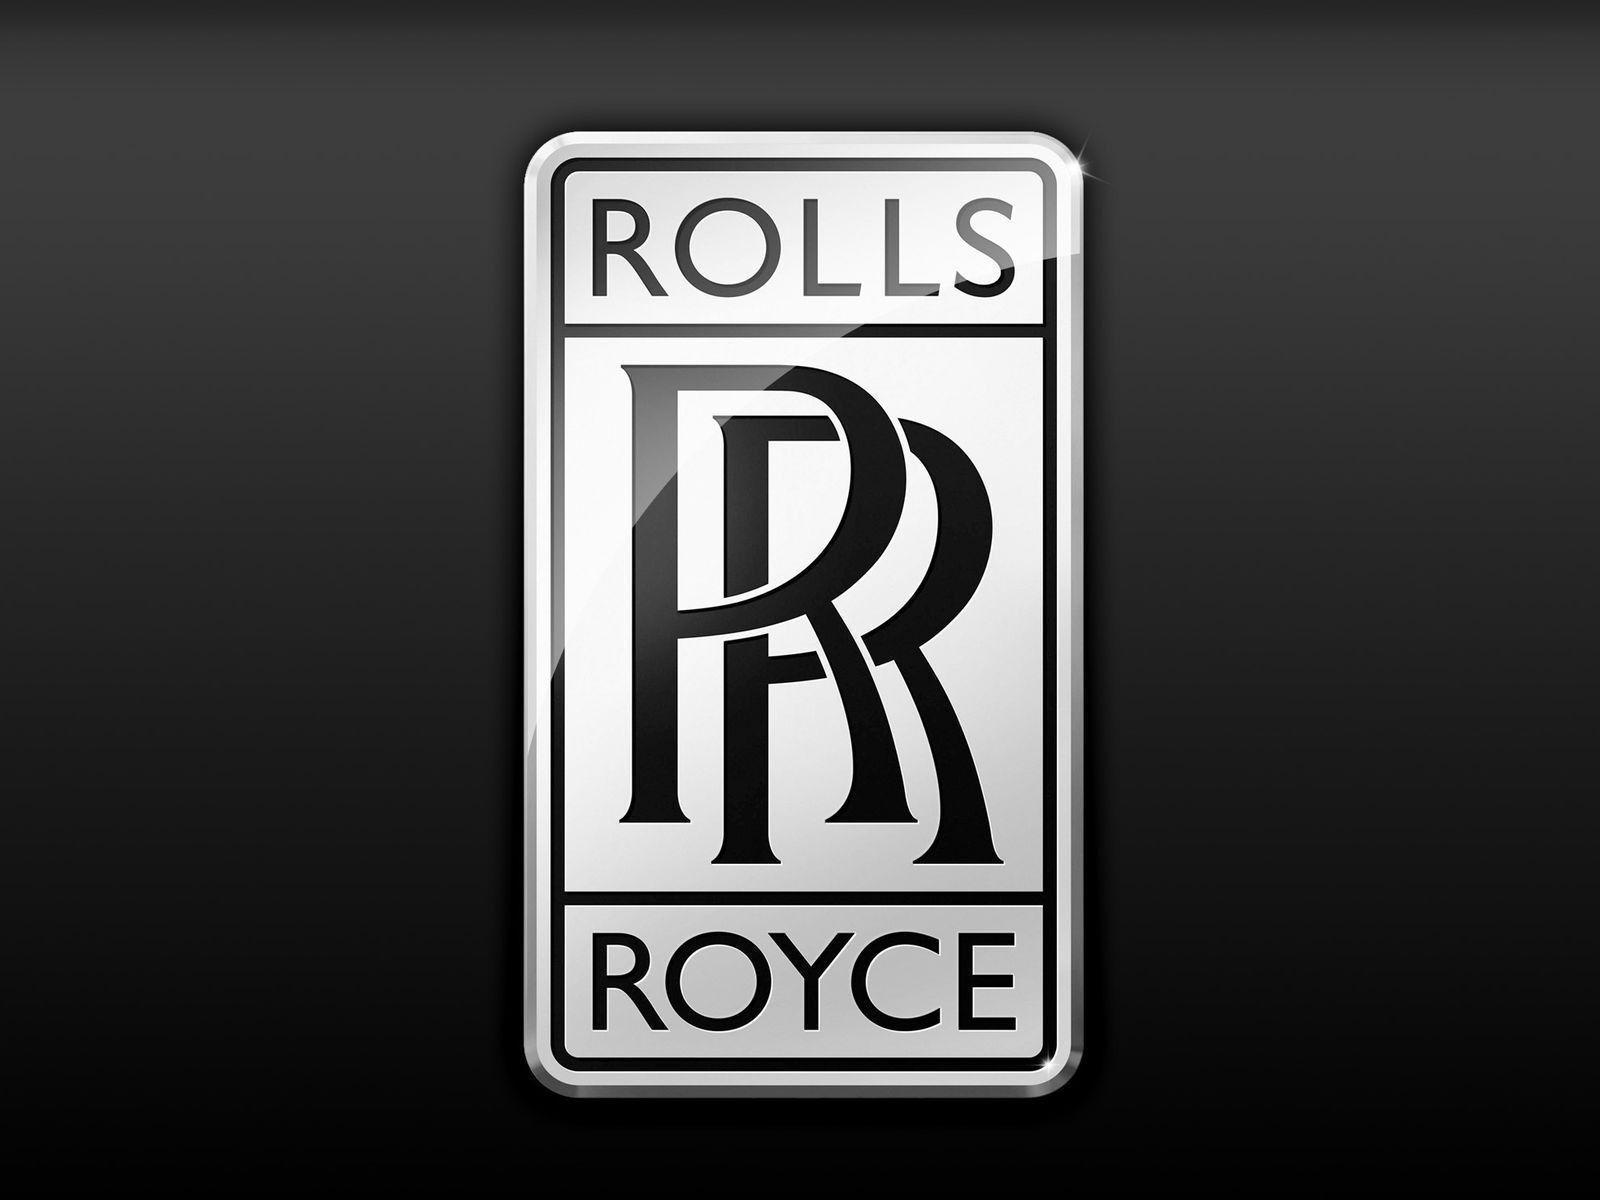 Rolls Royce Logo Wallpapers Top Free Rolls Royce Logo Backgrounds Wallpaperaccess